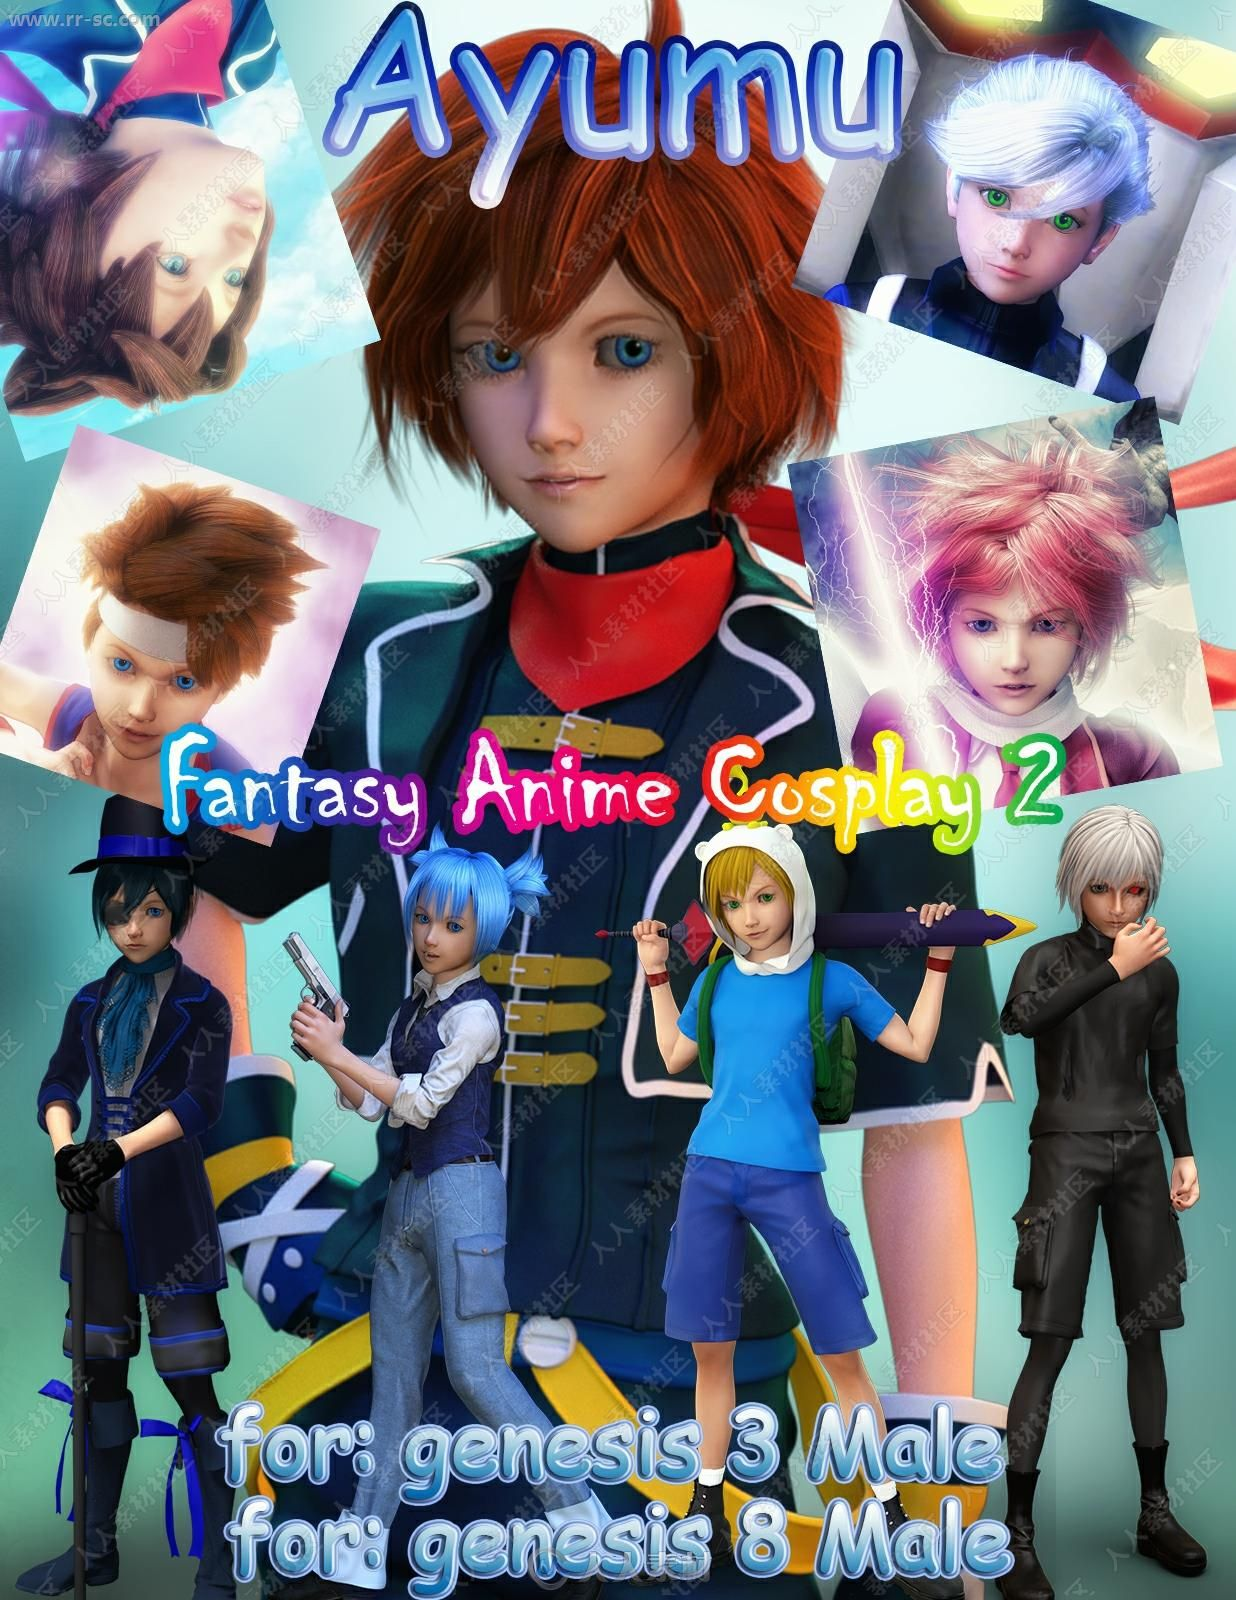 cosplay动漫多组造型二次元男孩角色3D模型